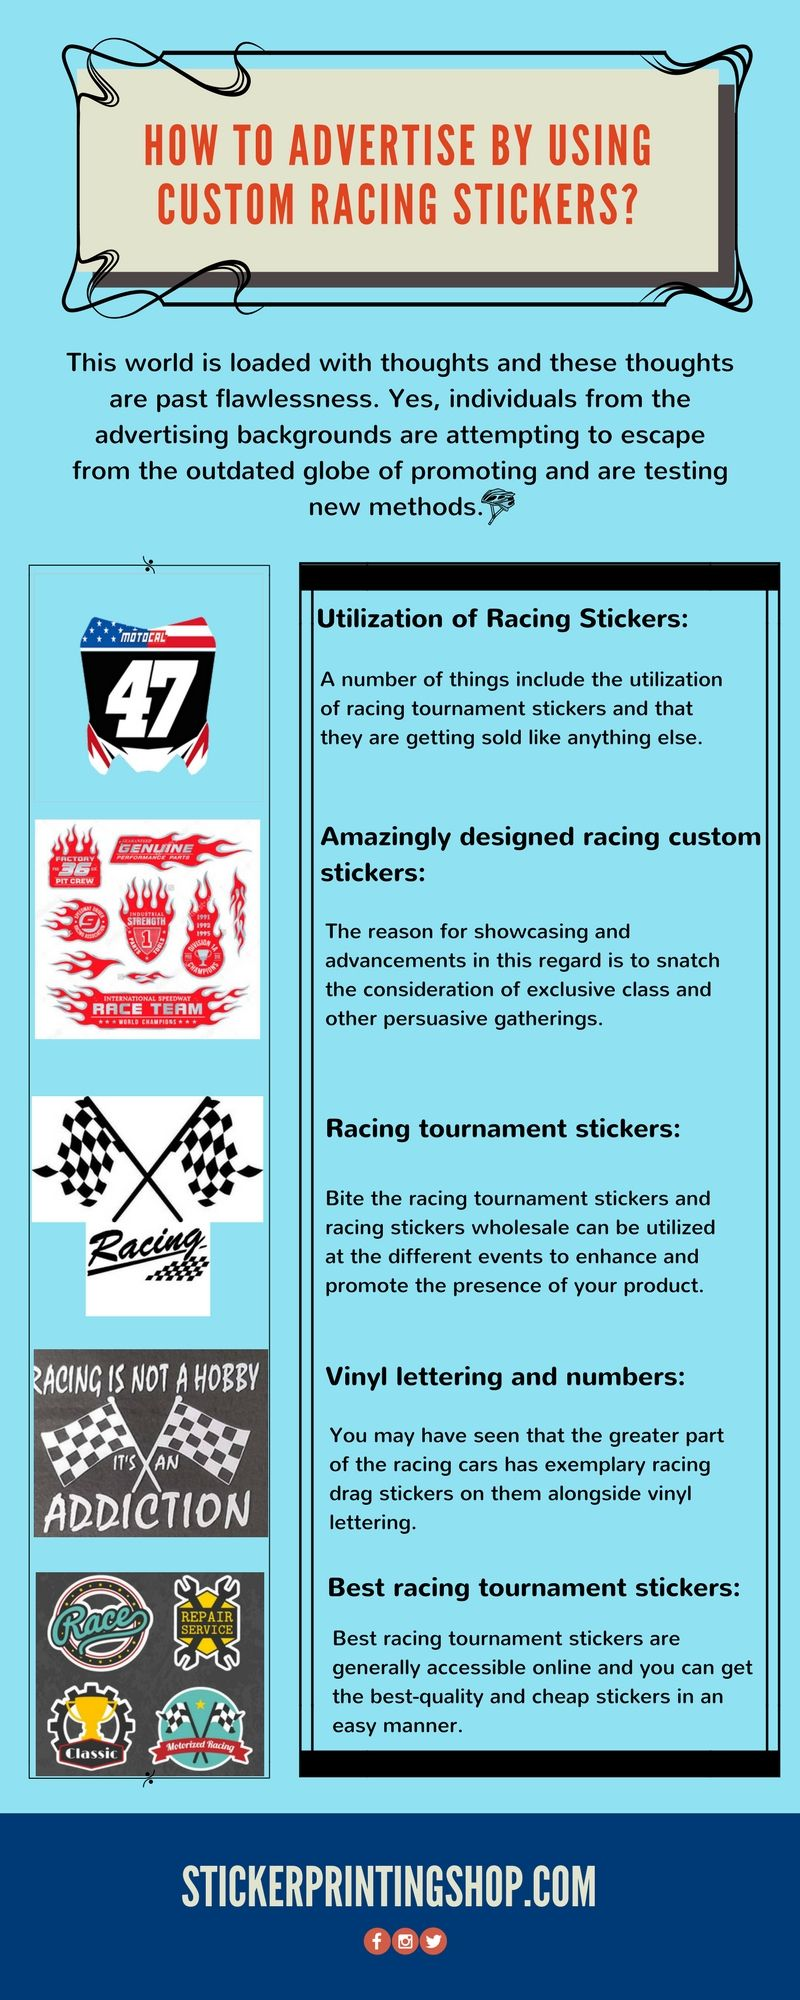 Bike stickers racing stickers custom stickers drag racing custom bikes advertising